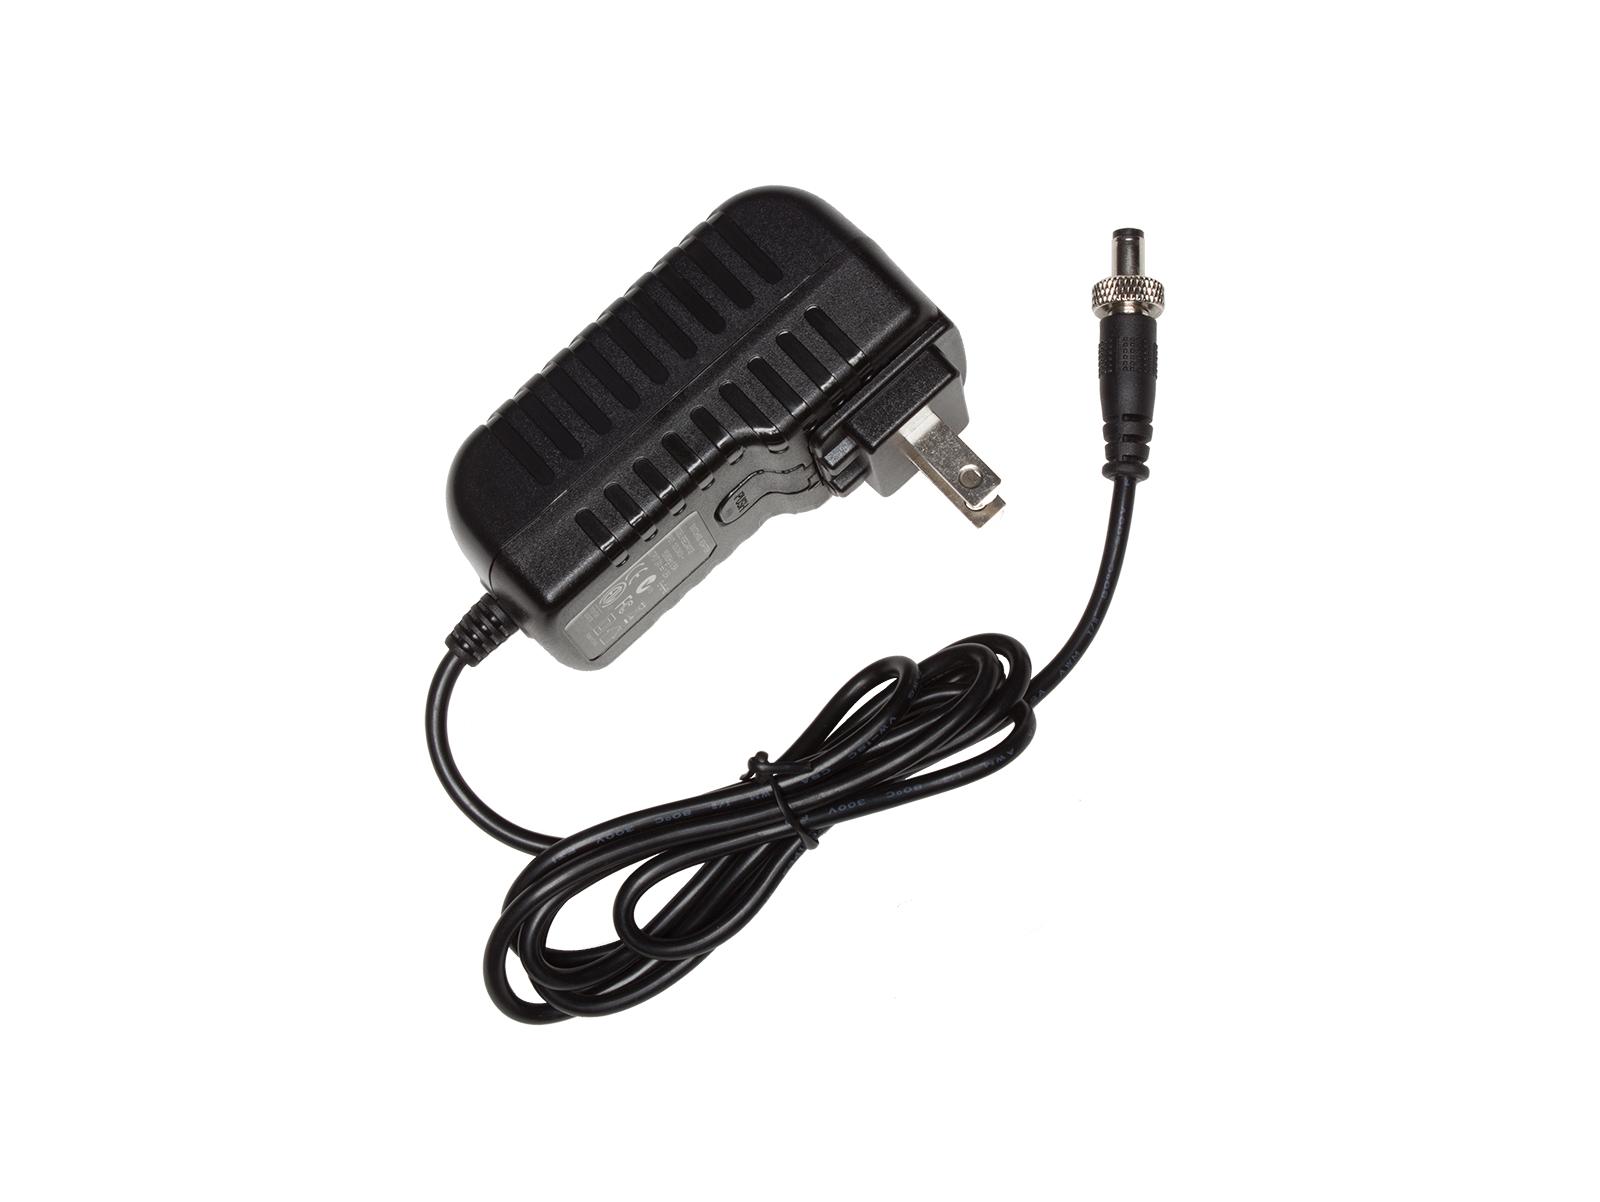 Atlas Sound TSD-PS24V2500MA 2500mA 24 VDC TSD Power Supply